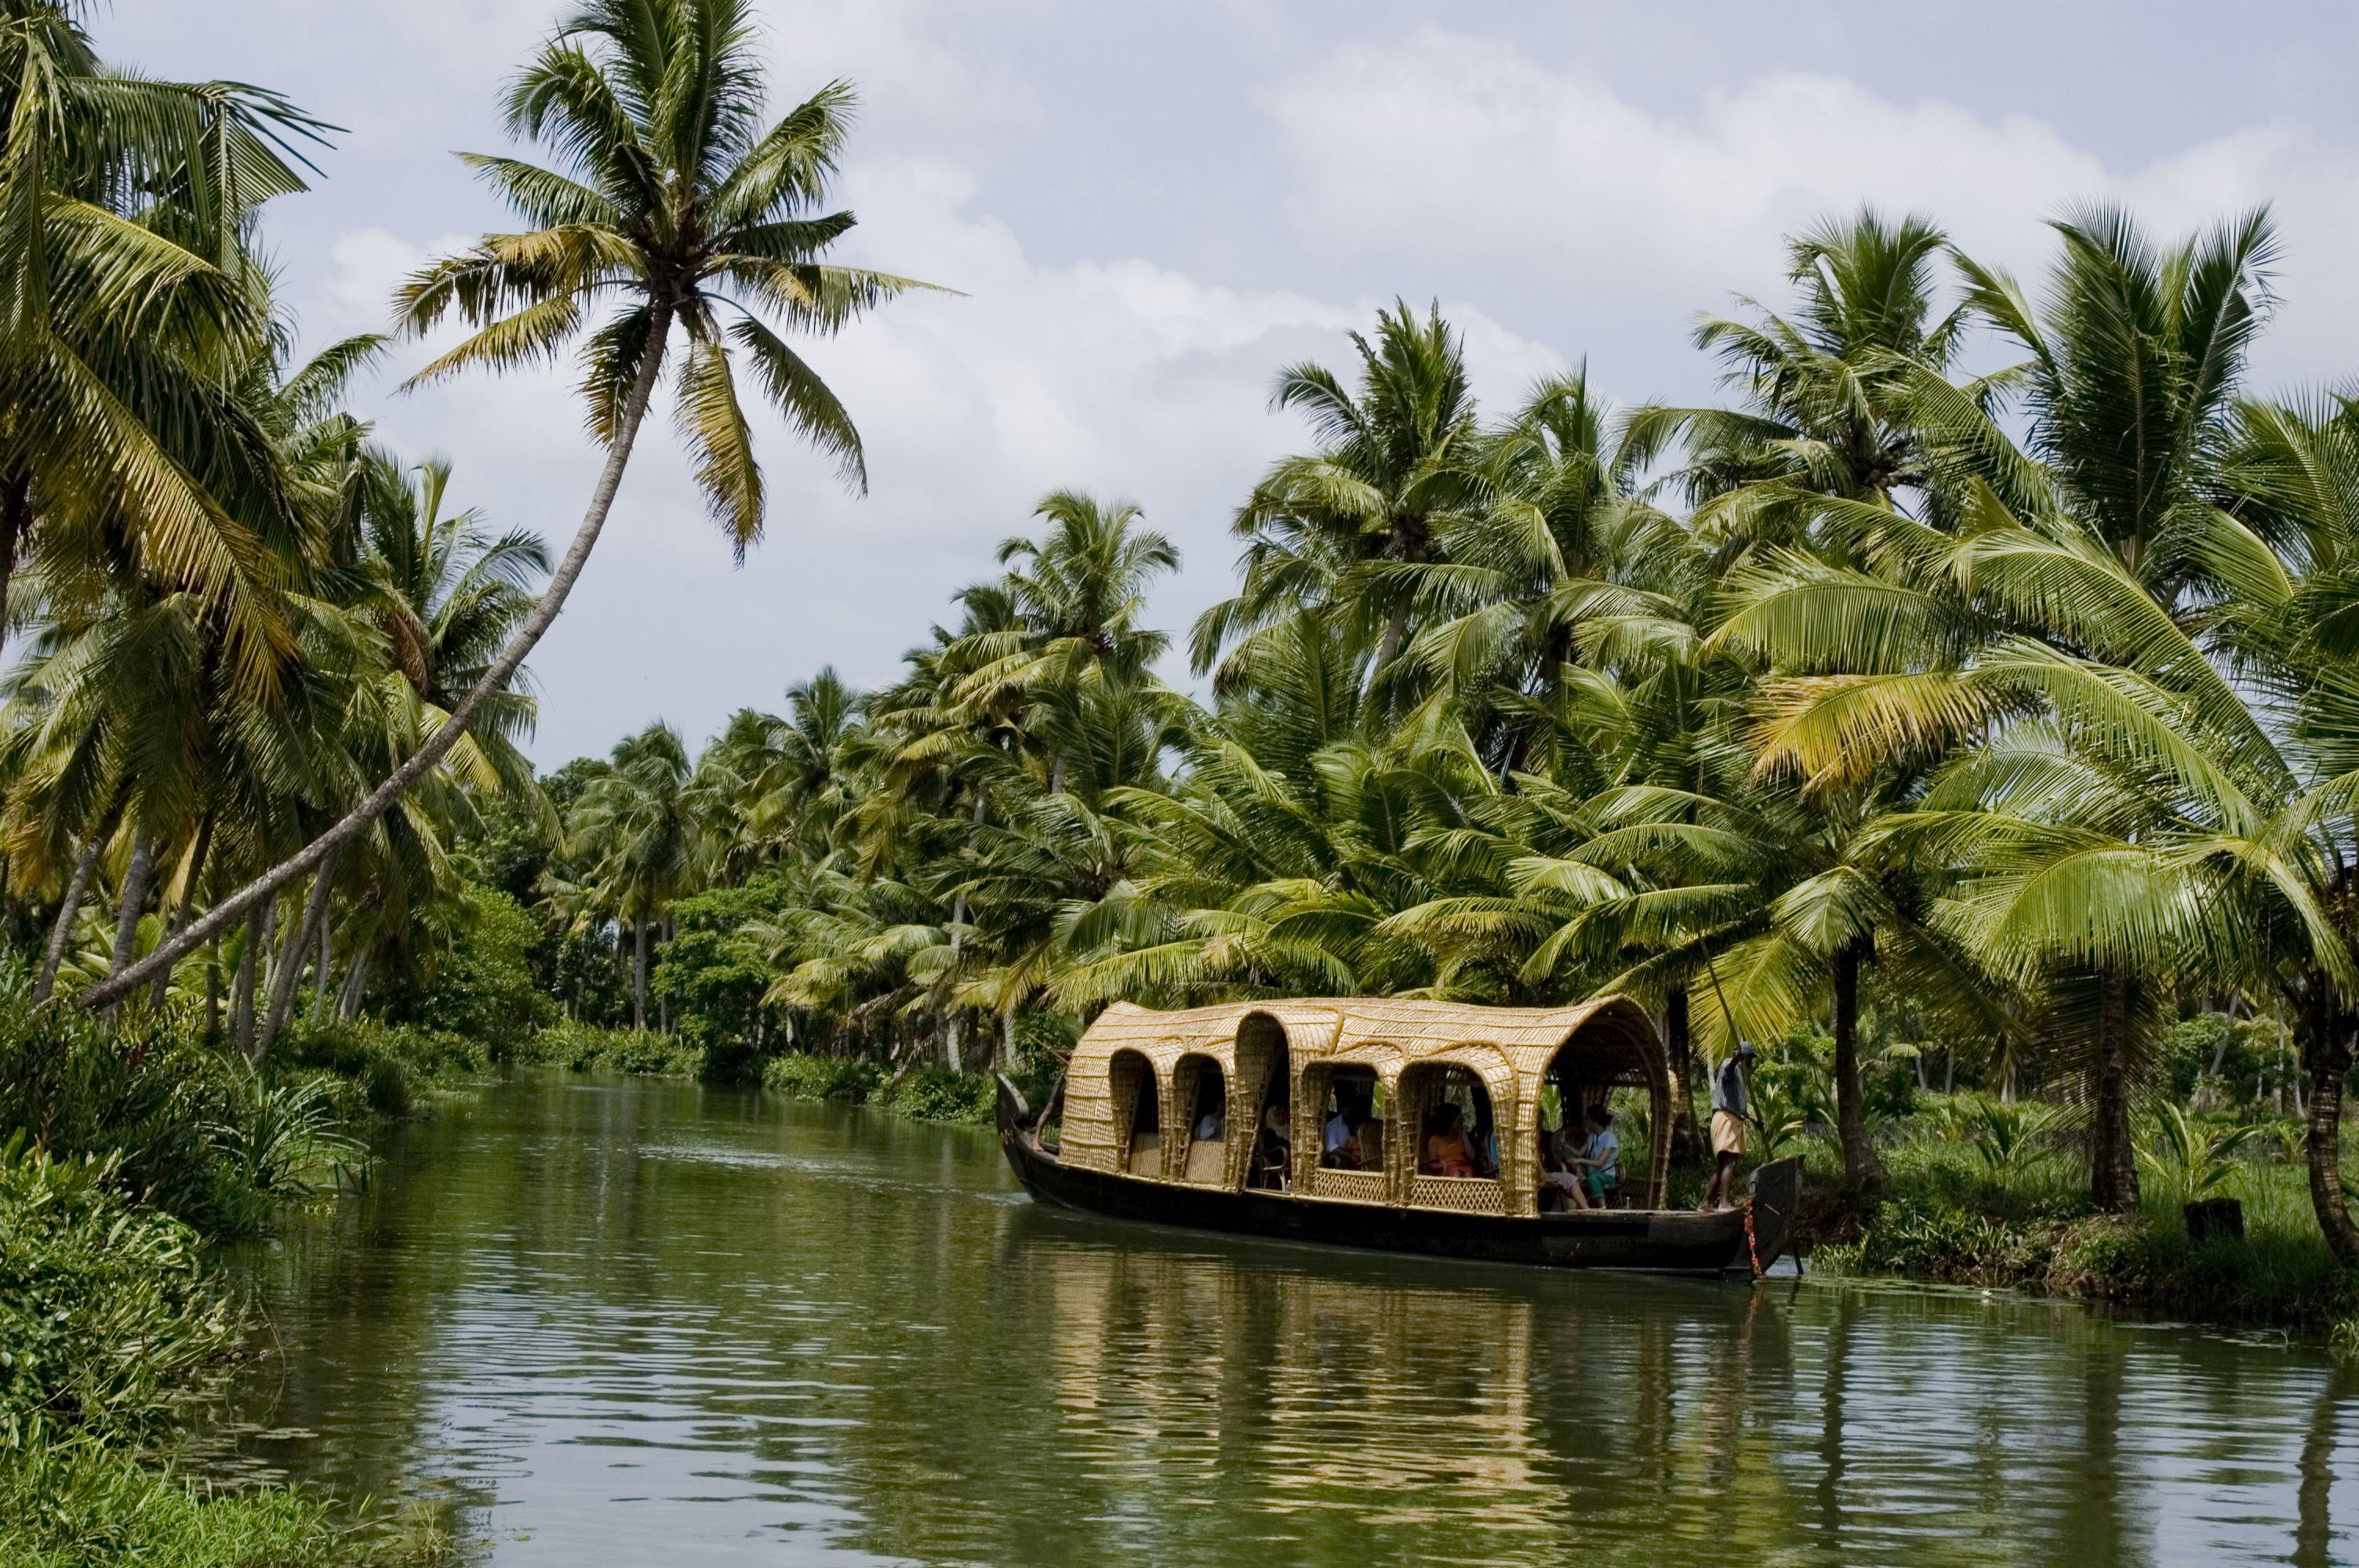 Houseboat in Kottayam, Kerala backwaters